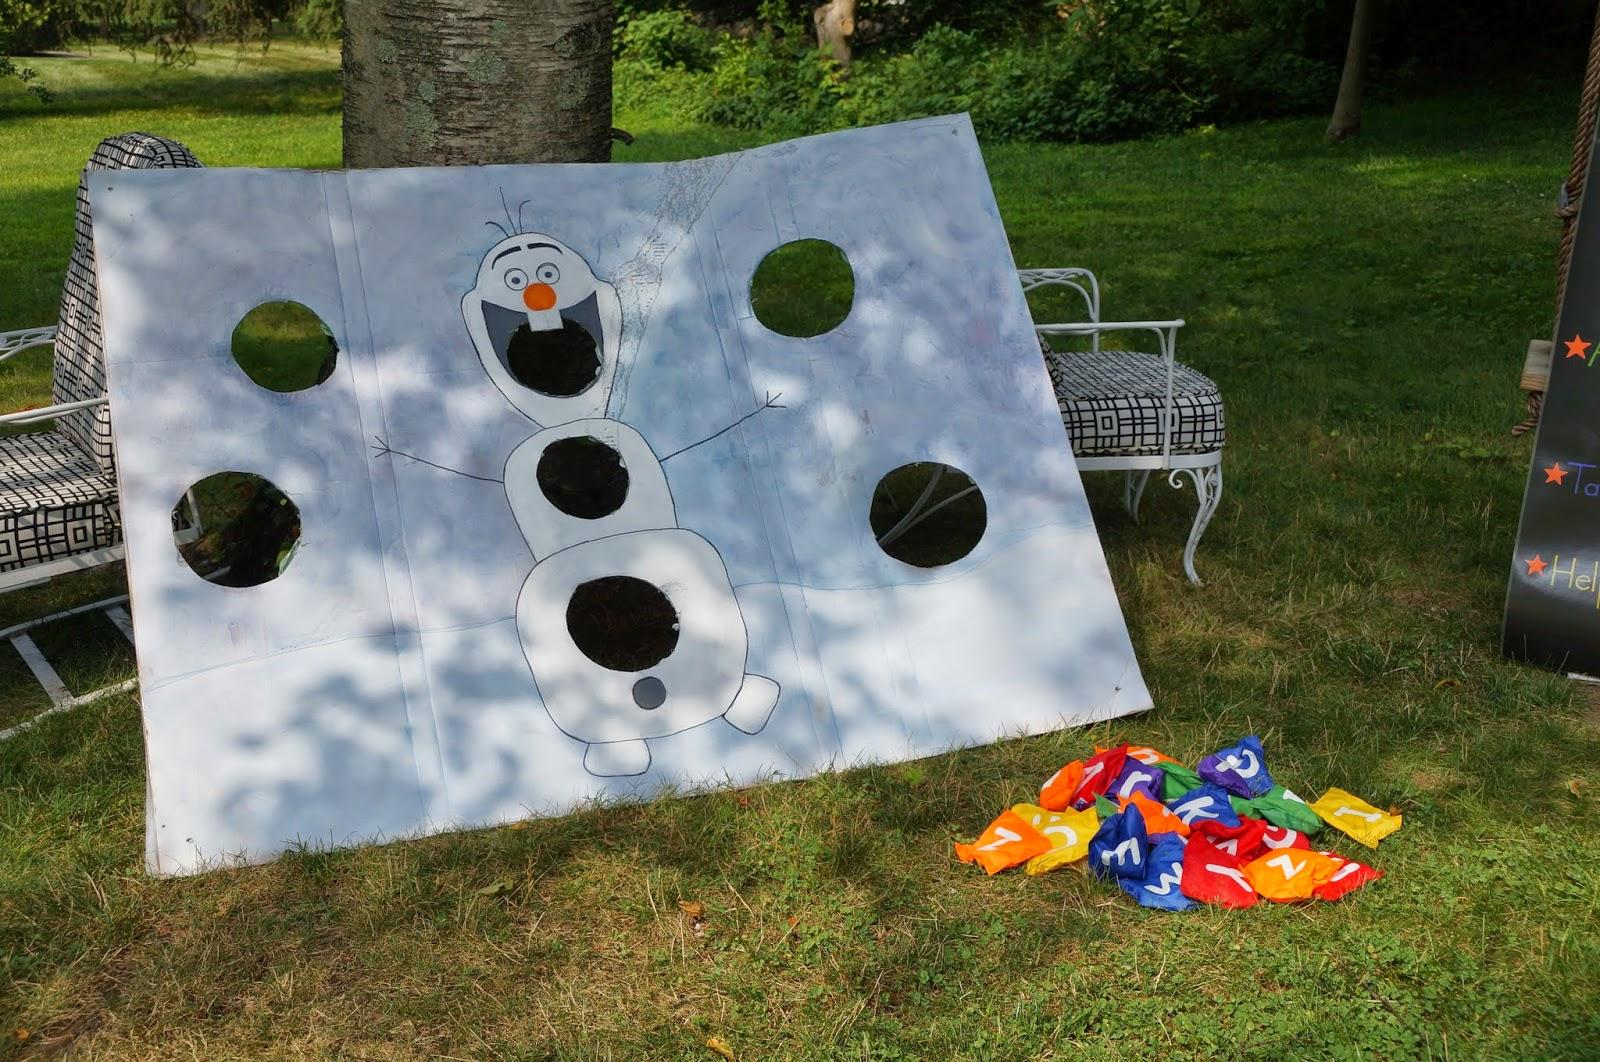 Astonishing Little Happies Frozen Fun Inspired Art Sensory Camp Machost Co Dining Chair Design Ideas Machostcouk